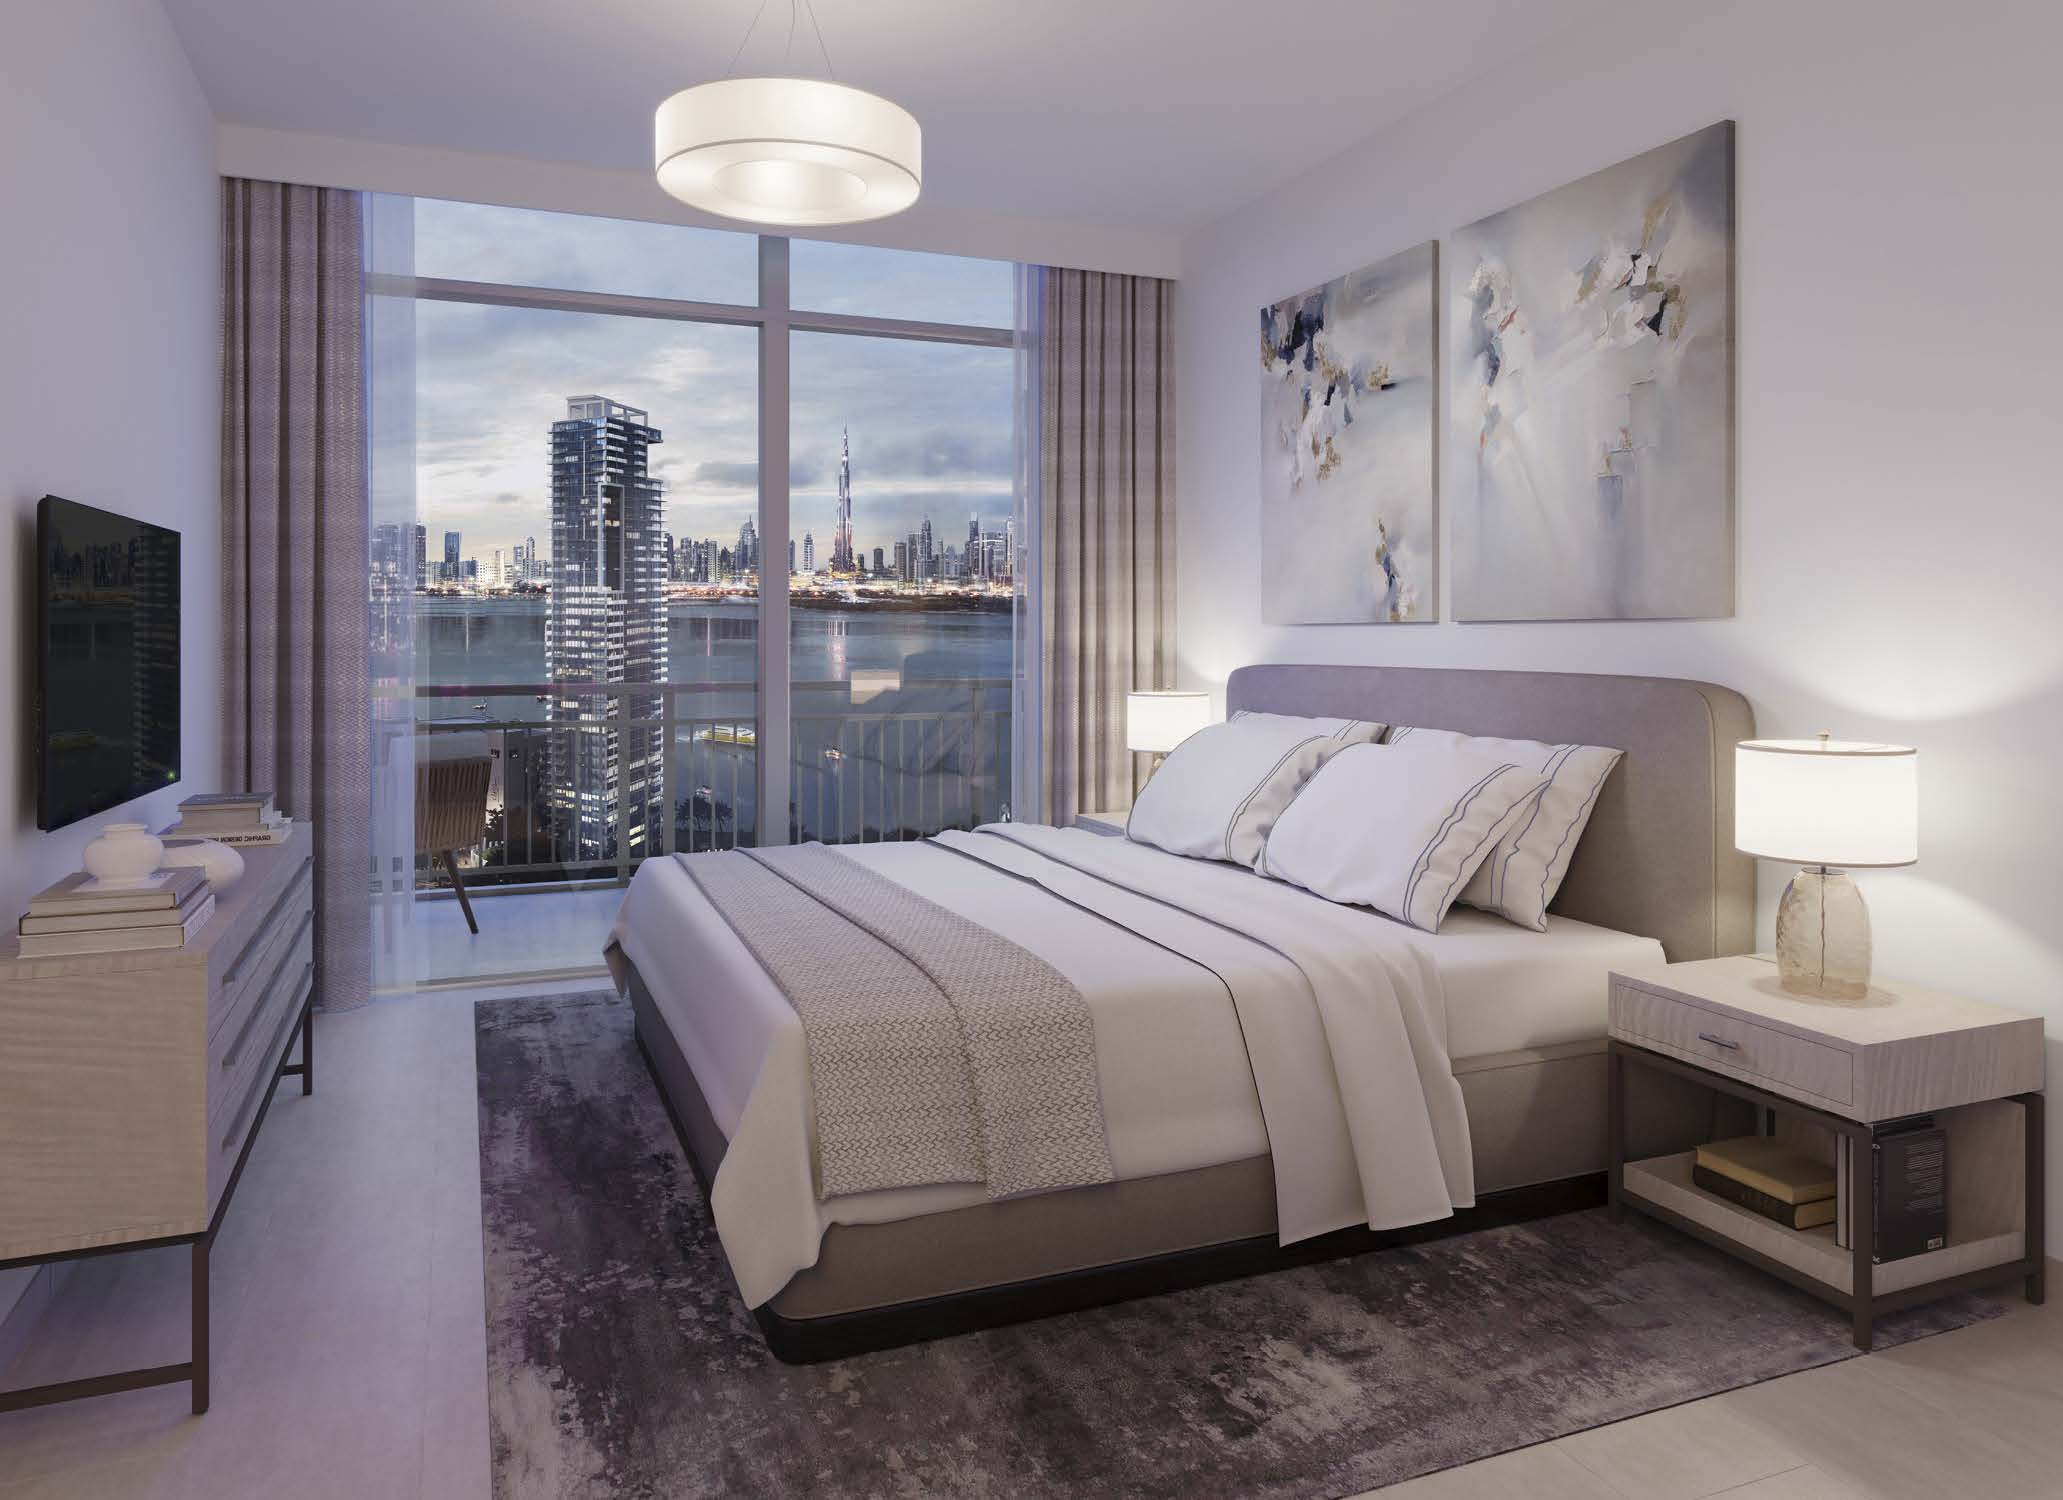 Creek Rise by Emaar in Dubai Creek Harbour. Luxury apartments for sale in Dubai._1